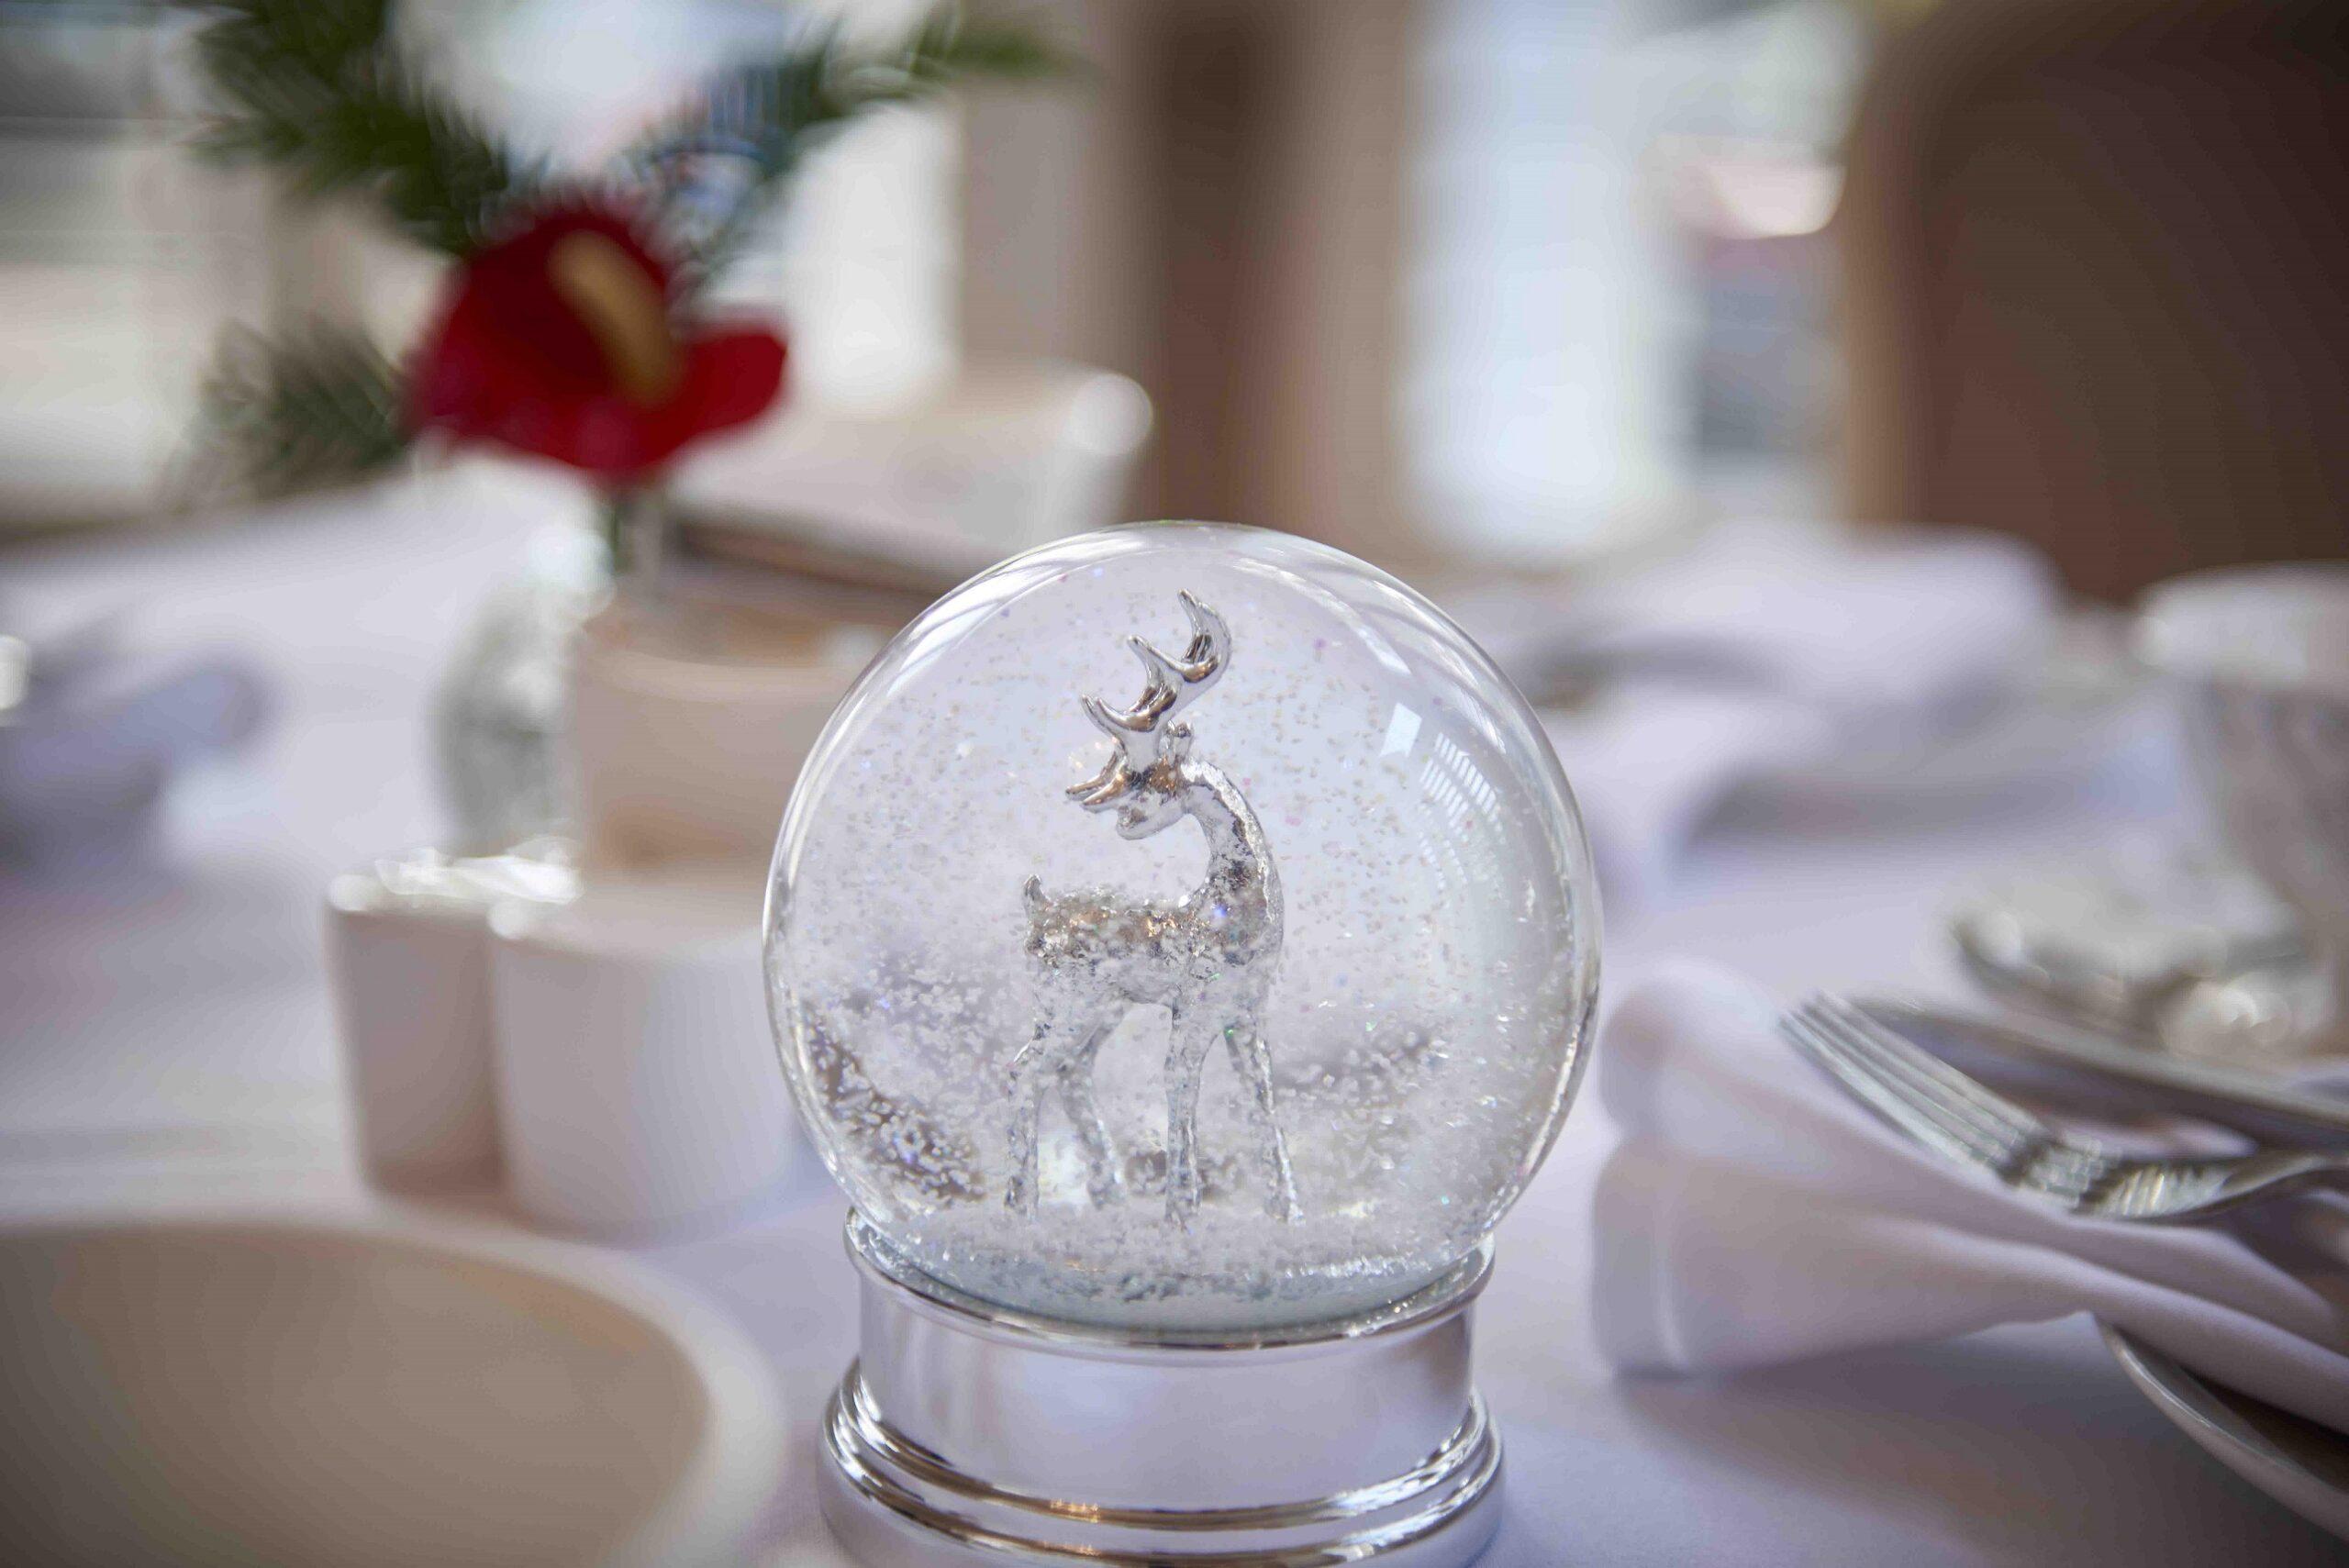 Burnham Beeches Christmas Dining